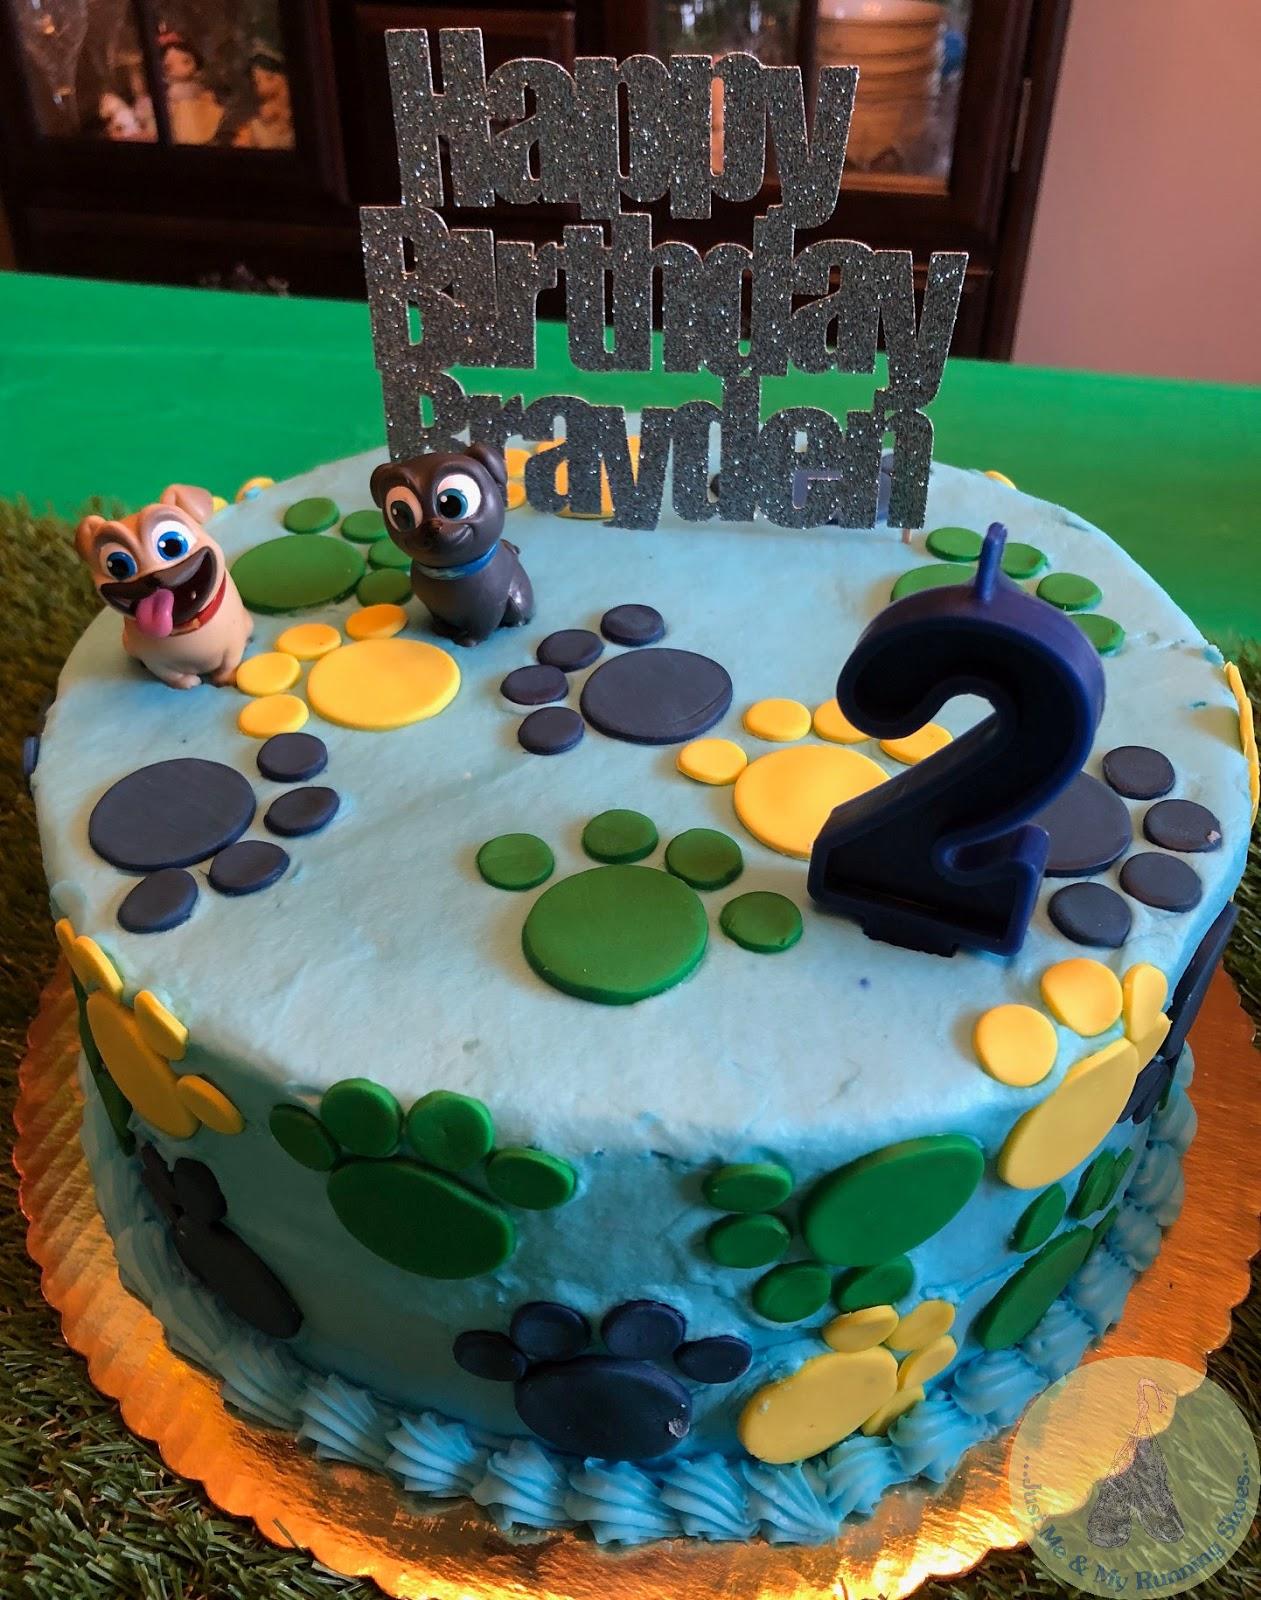 Puppy Dog Pals Birthday Party